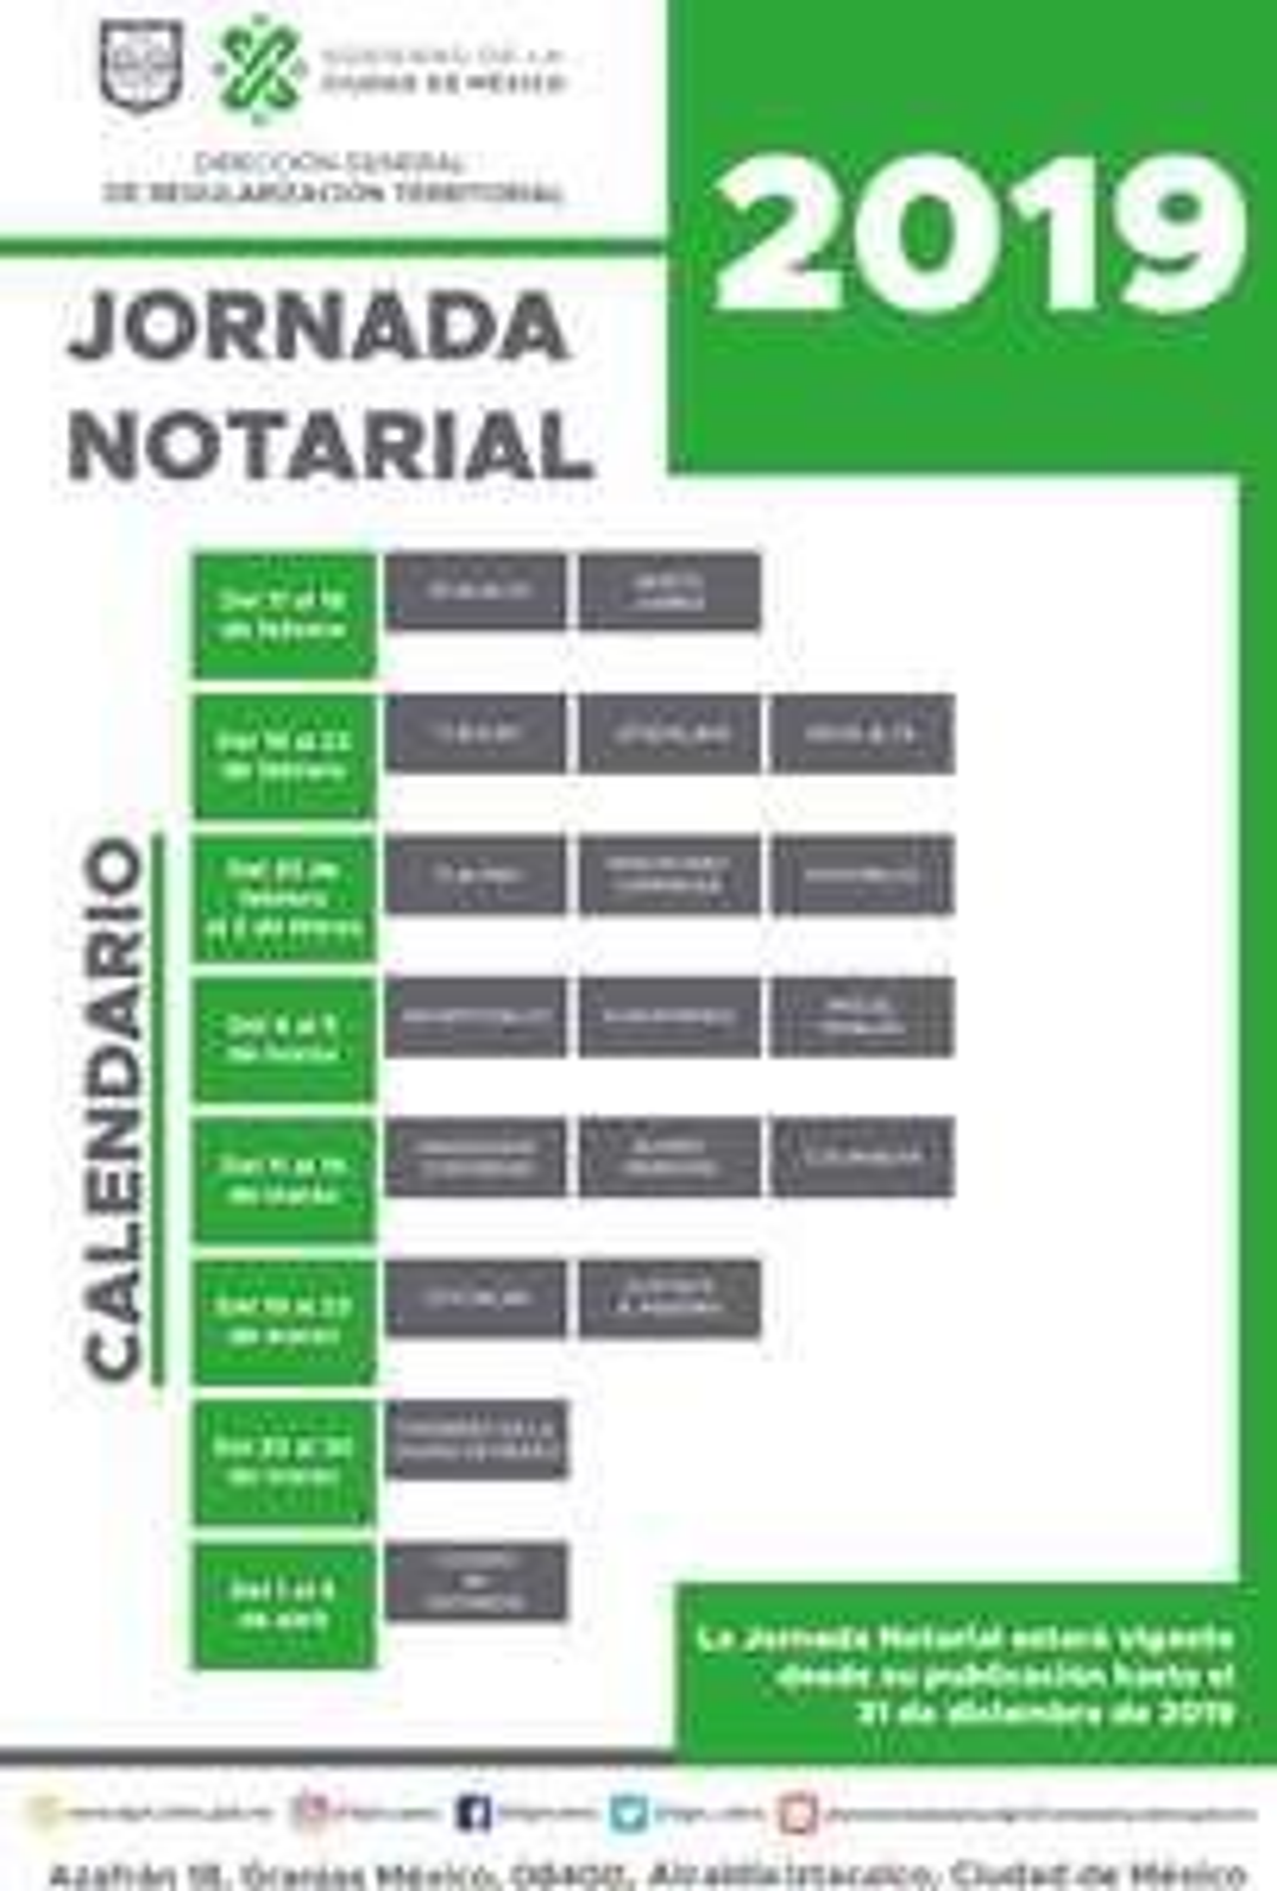 CDMX: Jornada Notarial 2019